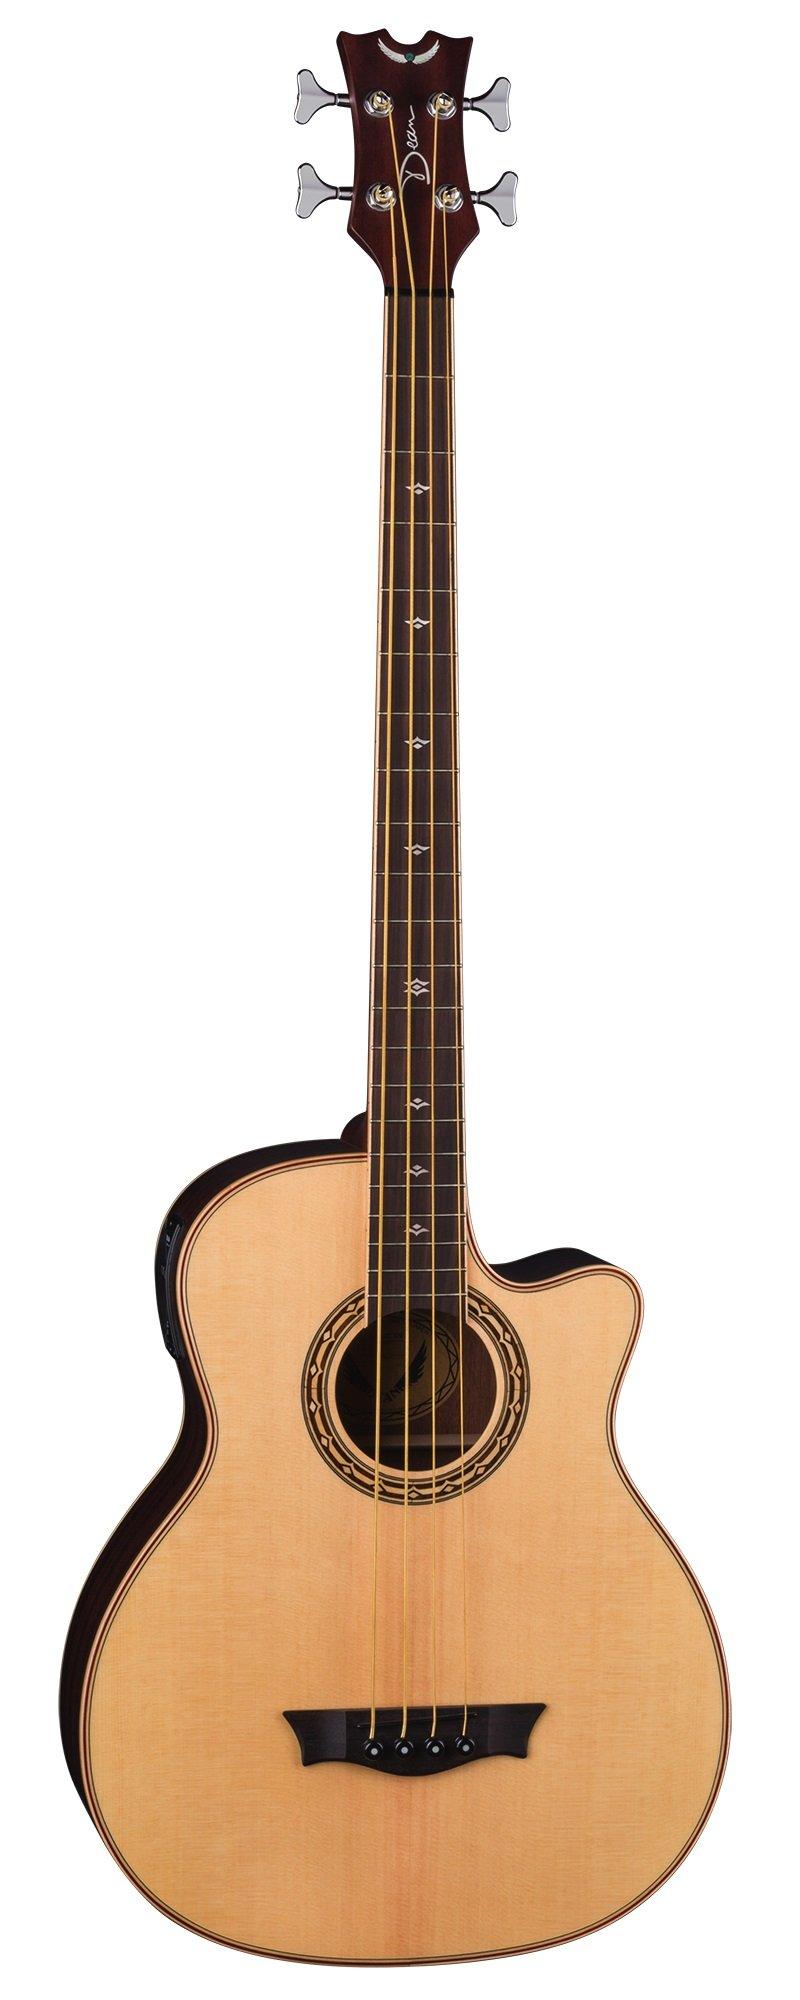 Dean EABCS SN 4-String Acoustic-Electric Bass Guitar, Natural